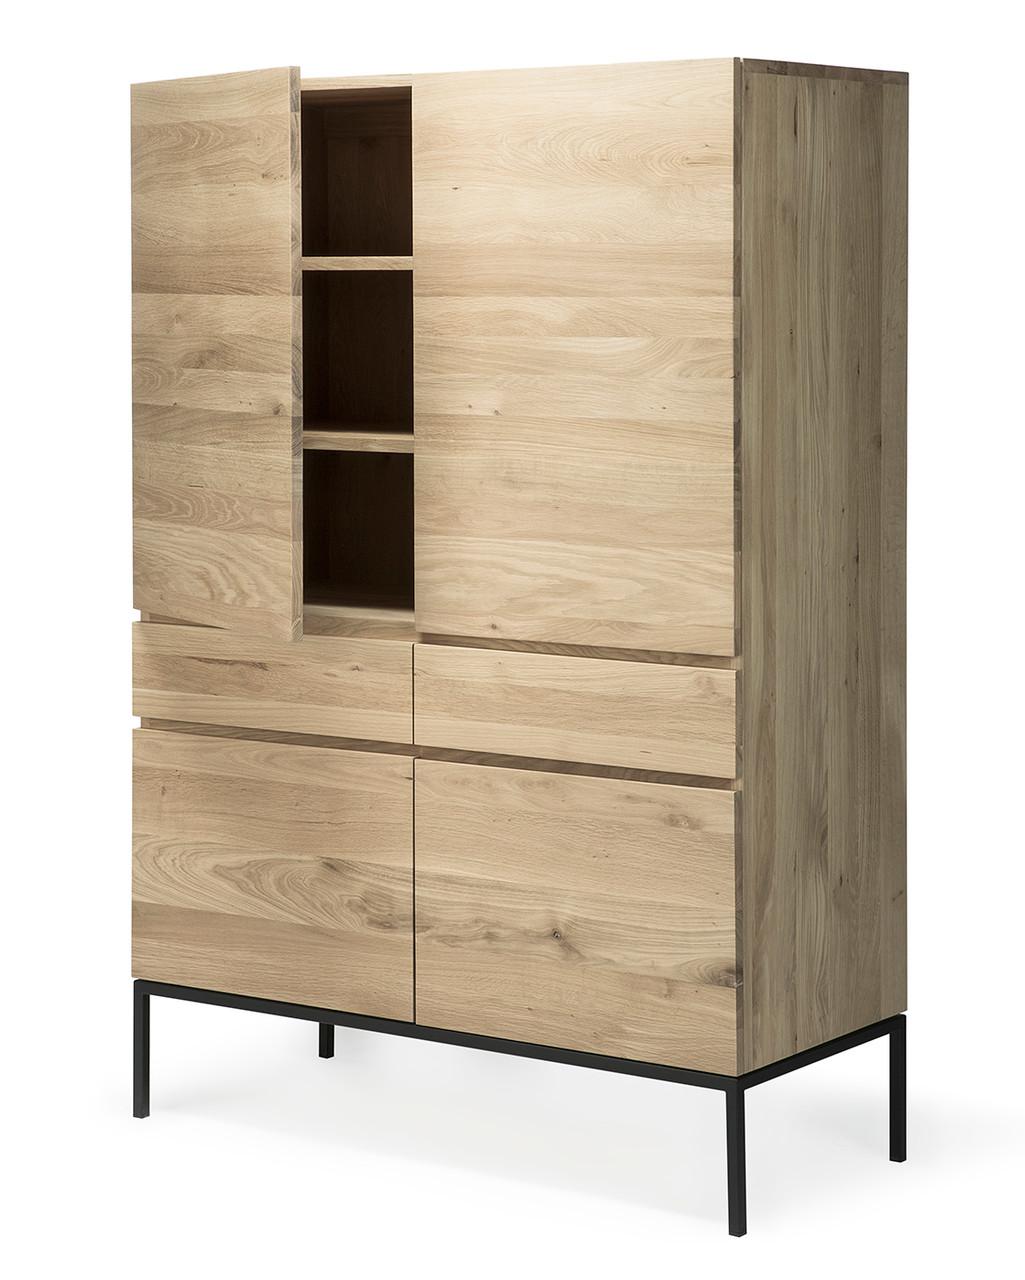 Light Oak Dundee Tall Storage Cabinet Black Metal Legs